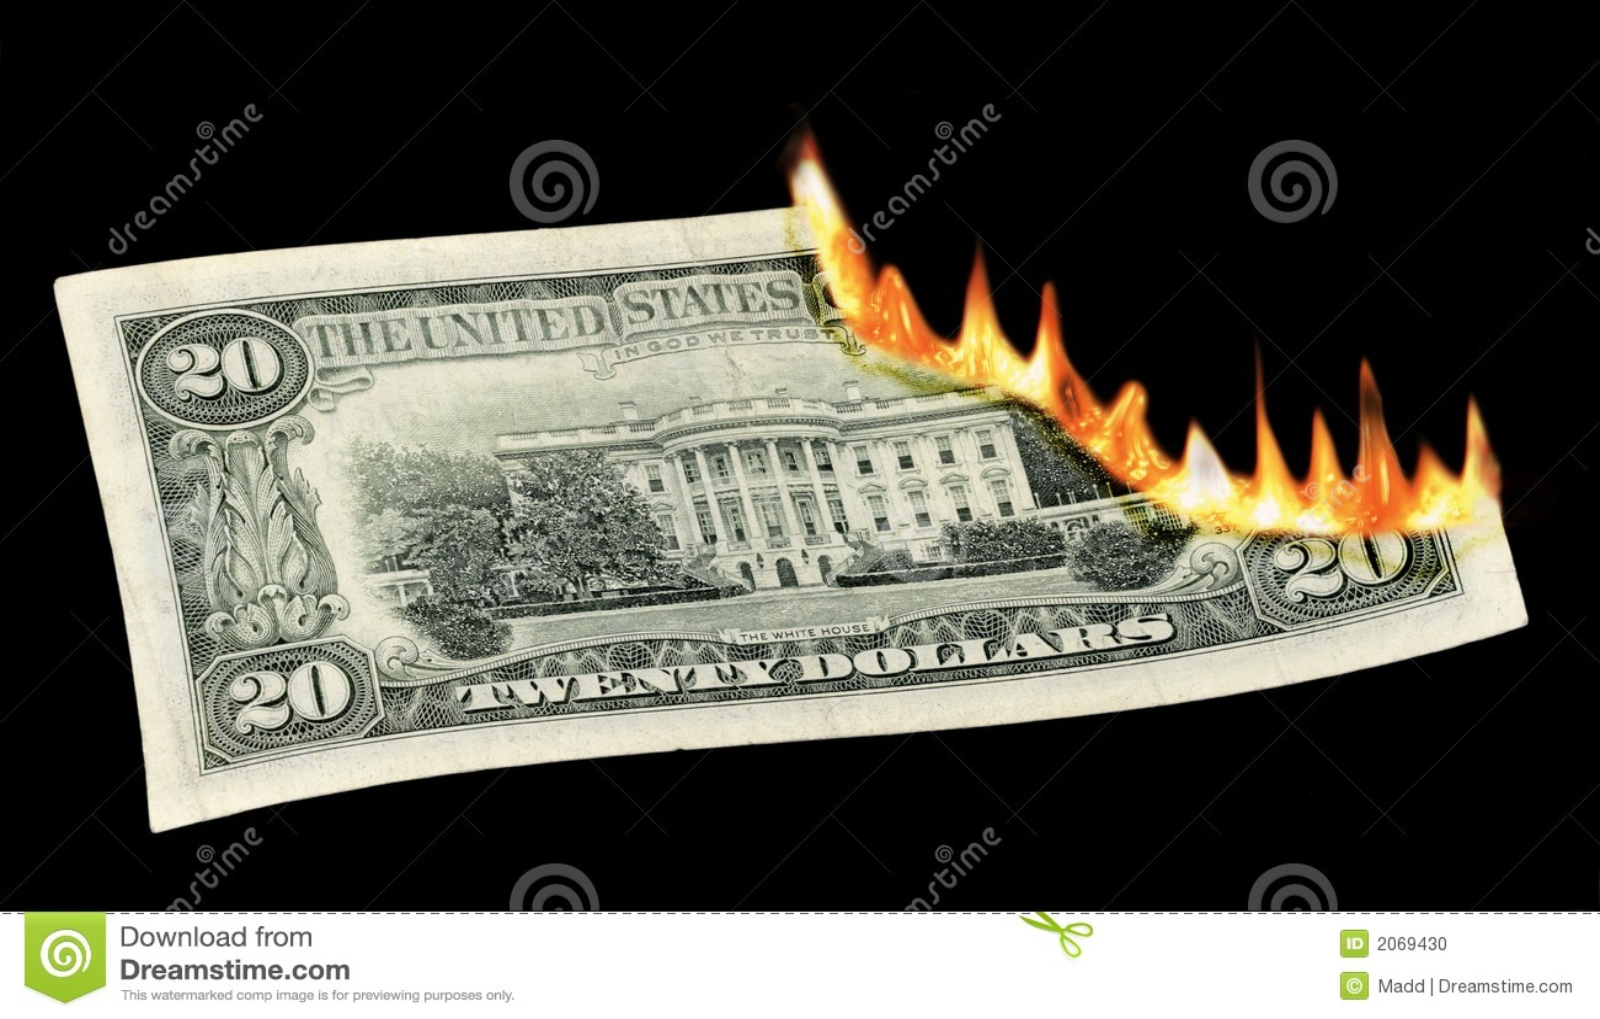 Money to Burn!